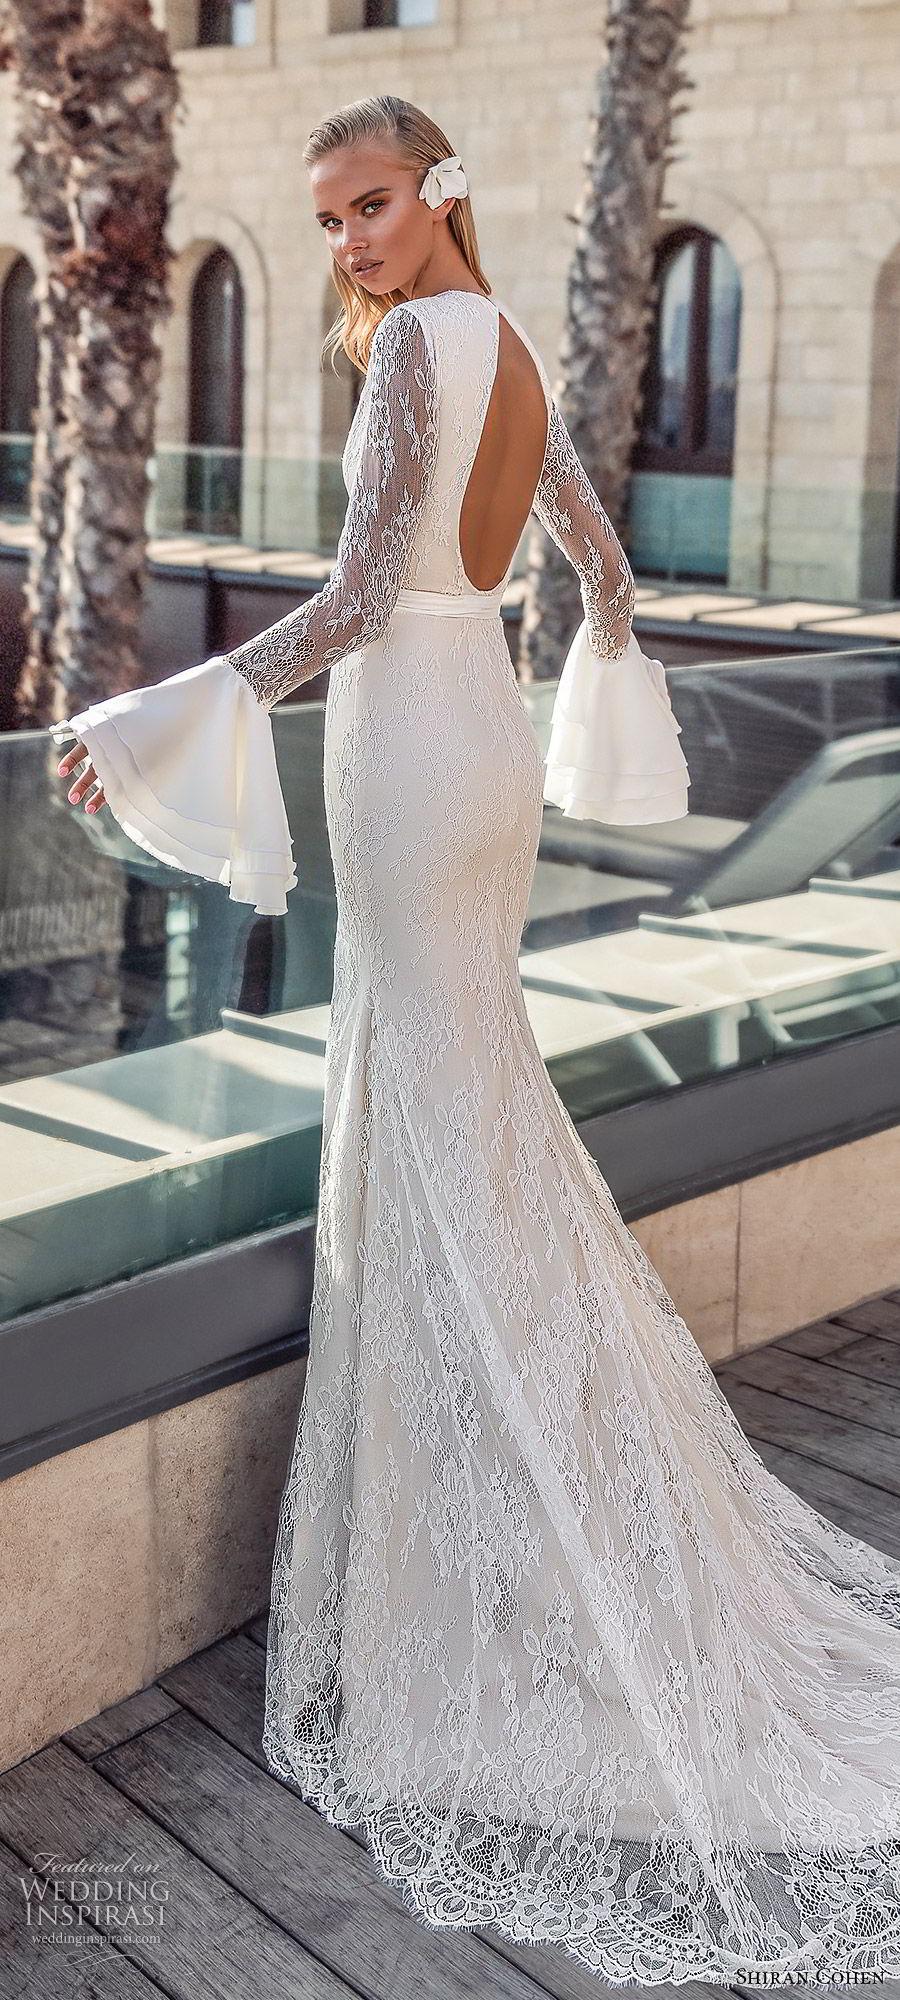 shiran cohen 2019 bridal long bell sleeves high neckline cutout bodice lace sheath trumpet wedding dress chapel train open back slit skirt sexy modern (3) zbv